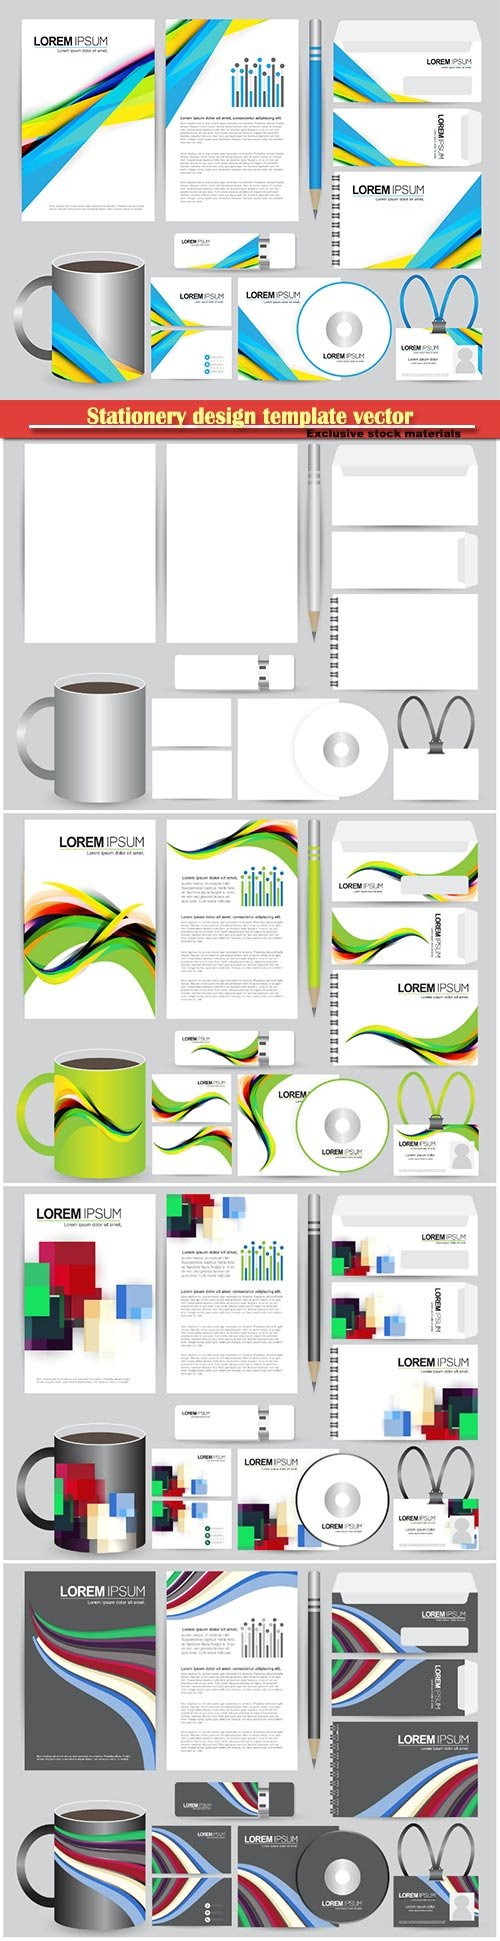 Stationery design template vector illustration